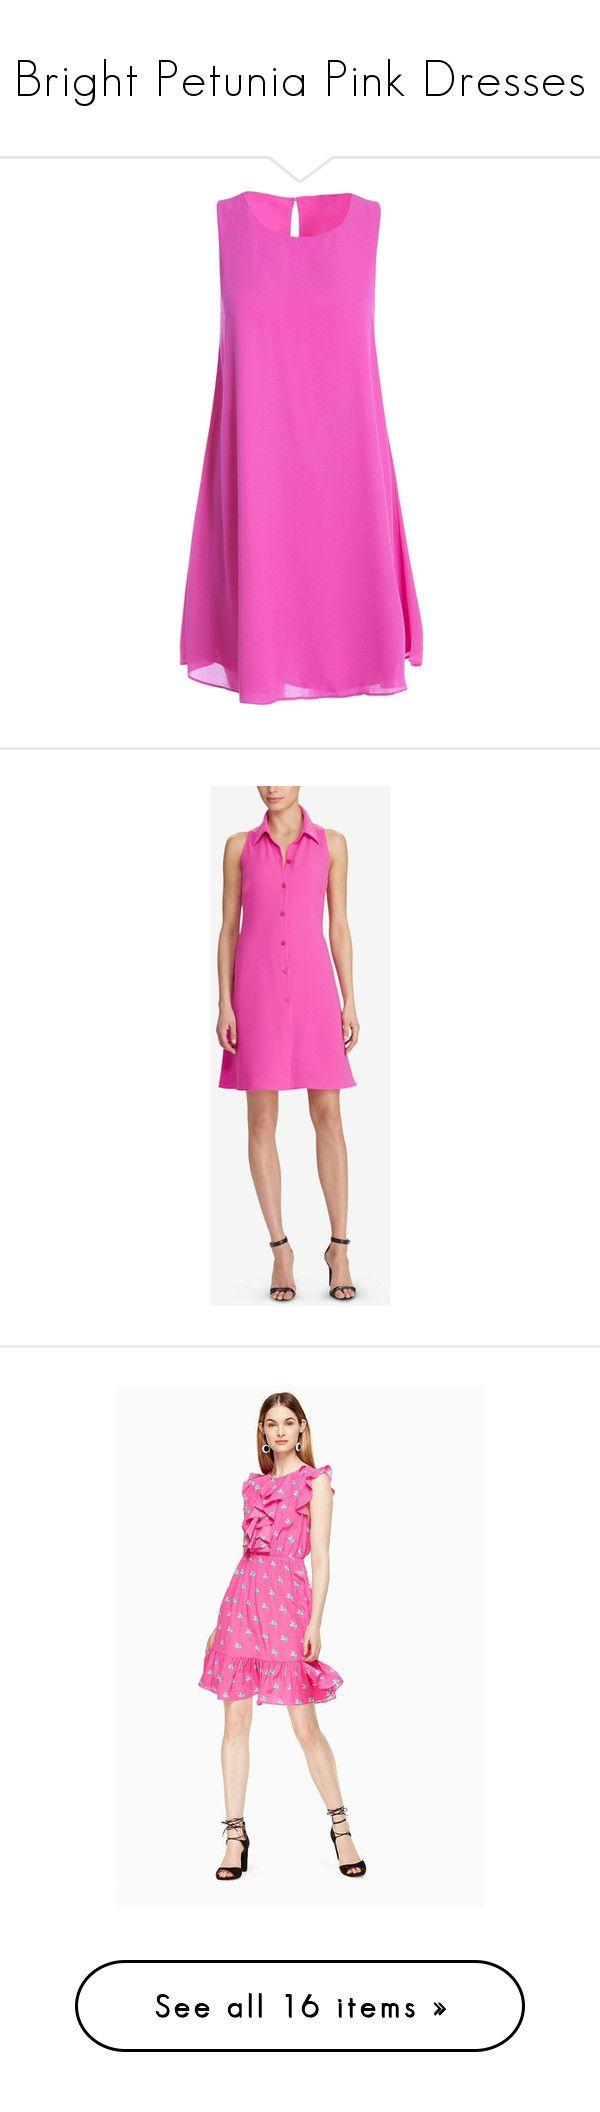 """Bright Petunia Pink Dresses"" by tegan-b-riley on Polyvore featuring dresses, fushia, sleeveless chiffon dress, pink shift dress, pink chiffon dresses, no sleeve dress, sleeveless shift dress, orchid pink, a line shape dress and petite a line dresses"